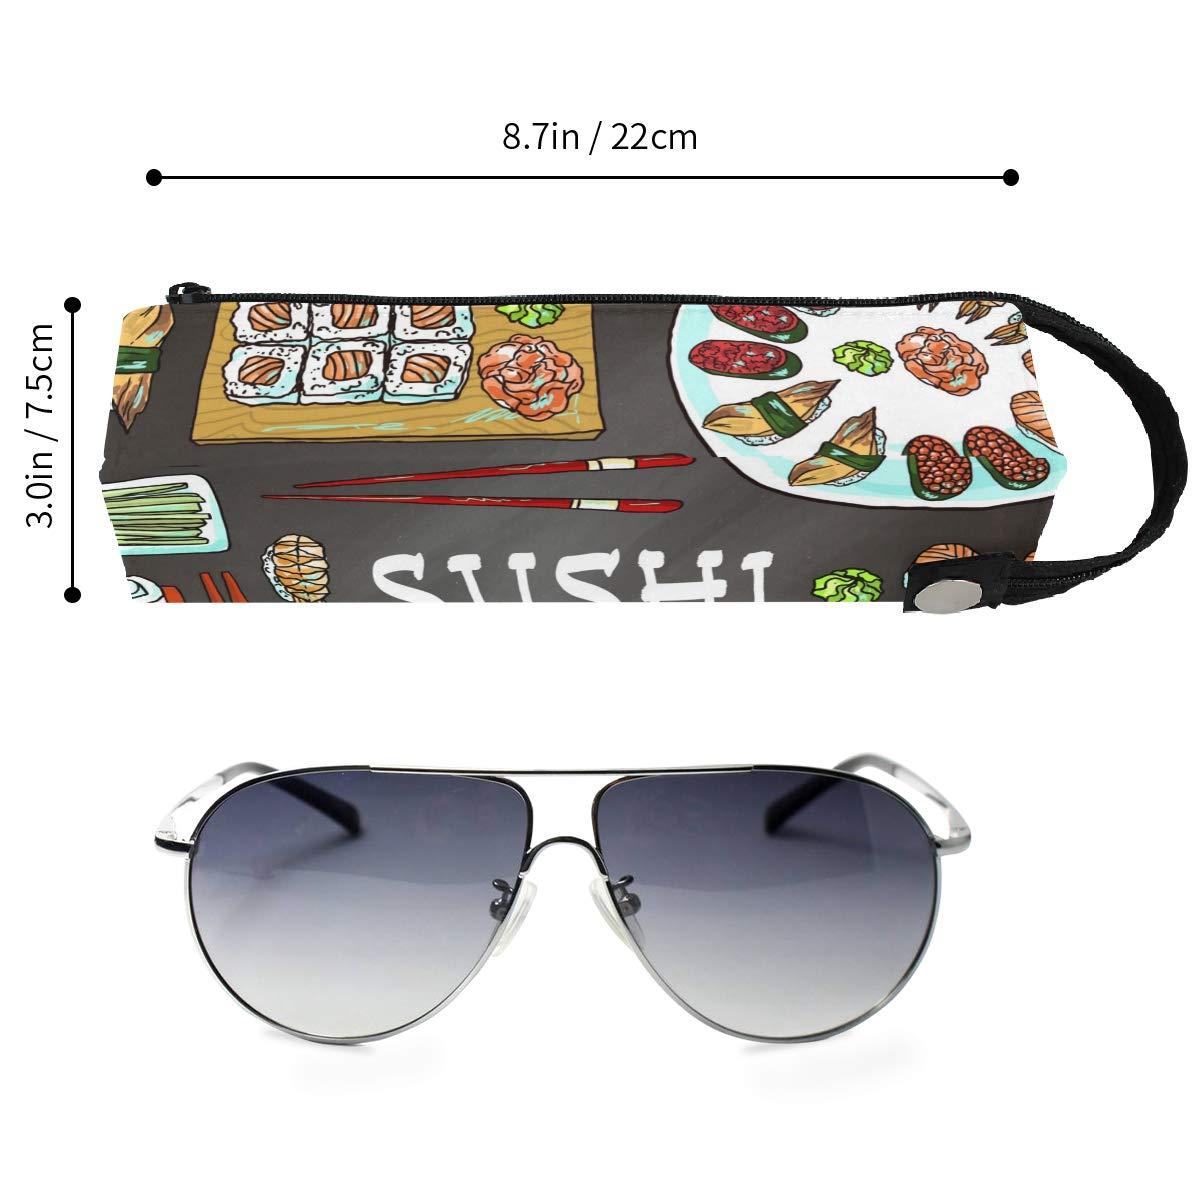 My Little Nest Eyeglass Sunglasses Holder Pouch Bag Sushi Multi Function Zipper Pen Case Pencil Bag Organizer